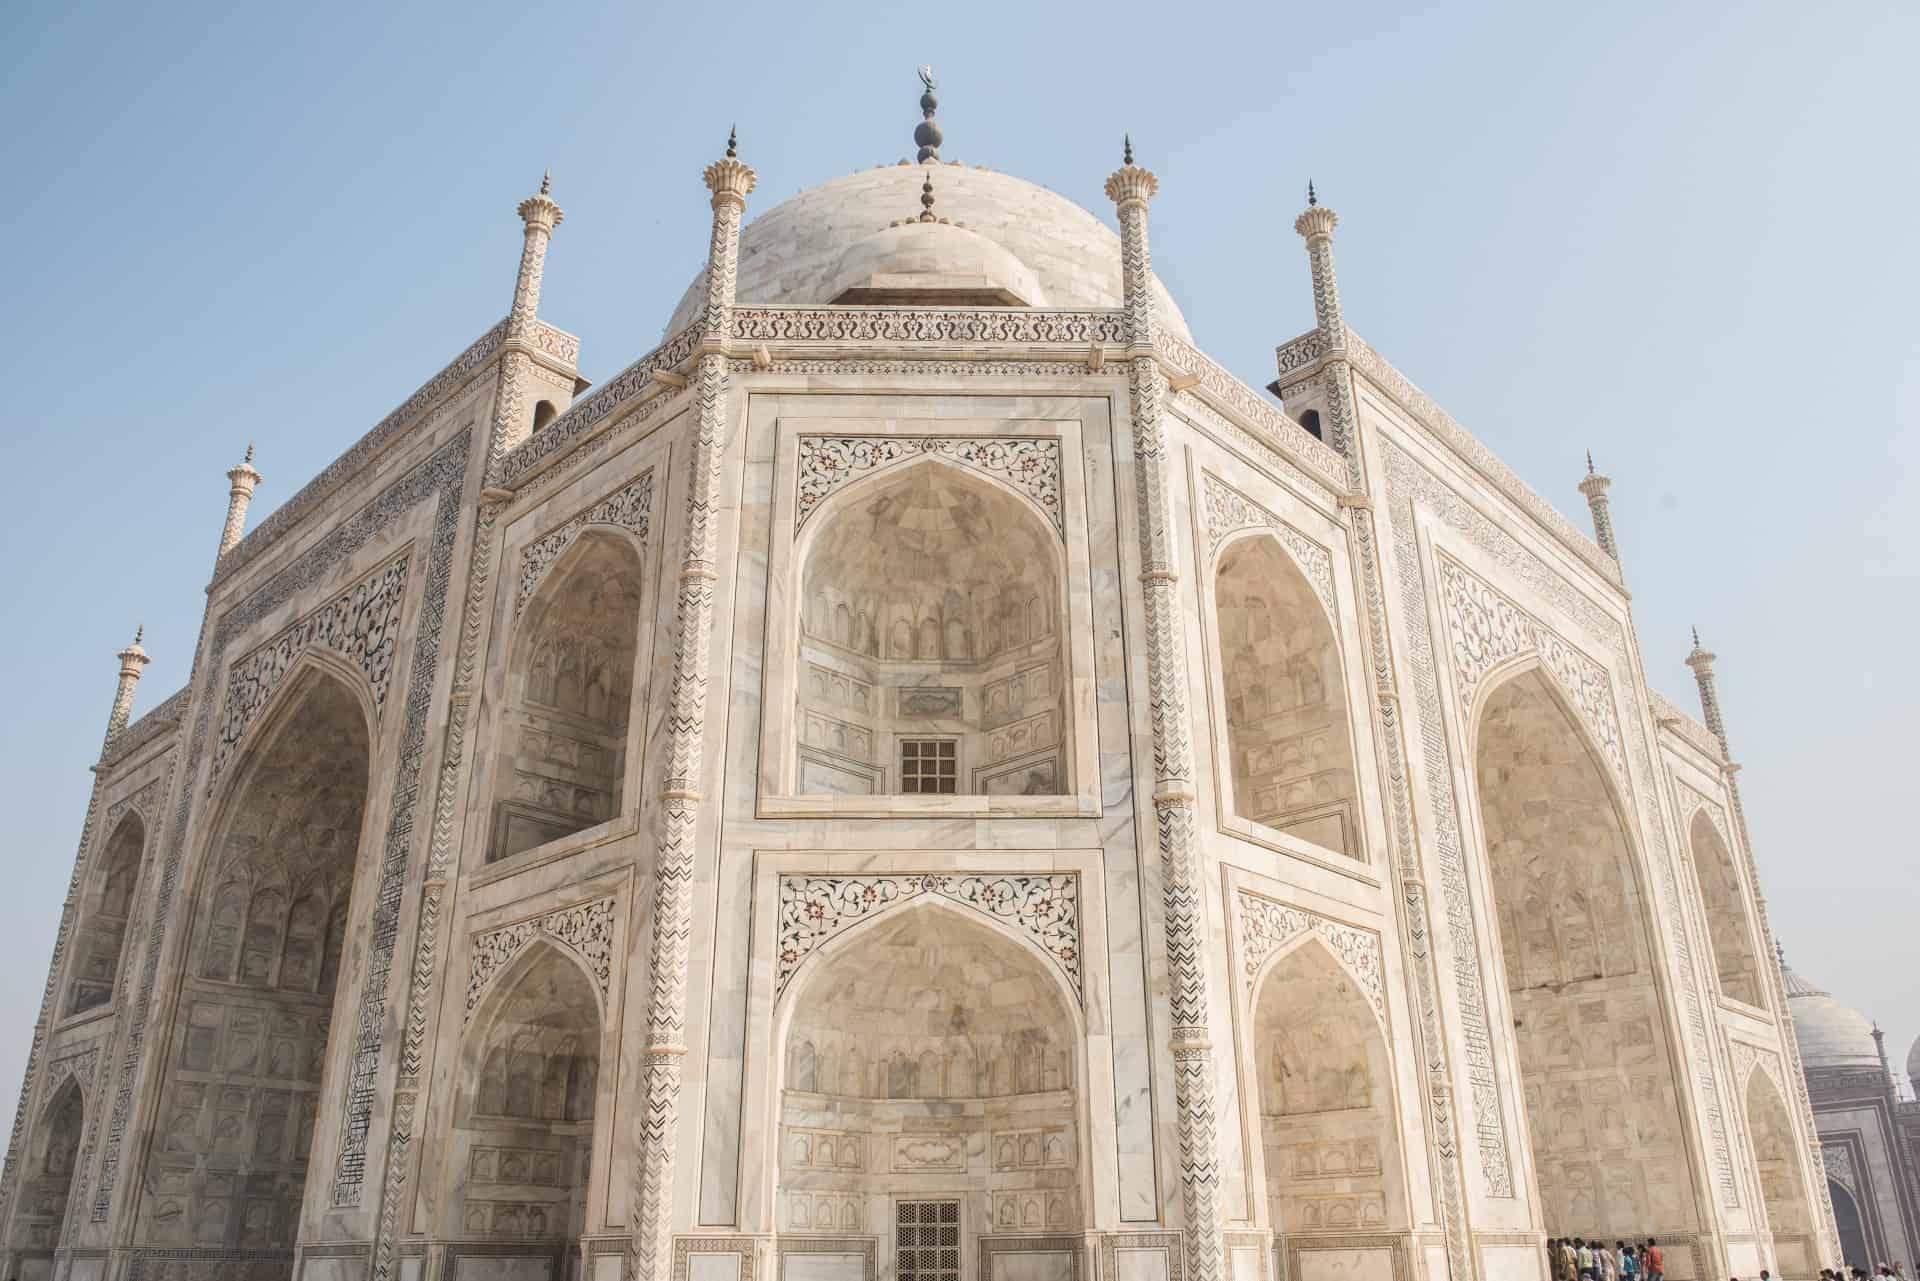 The marble of the Taj Mahal